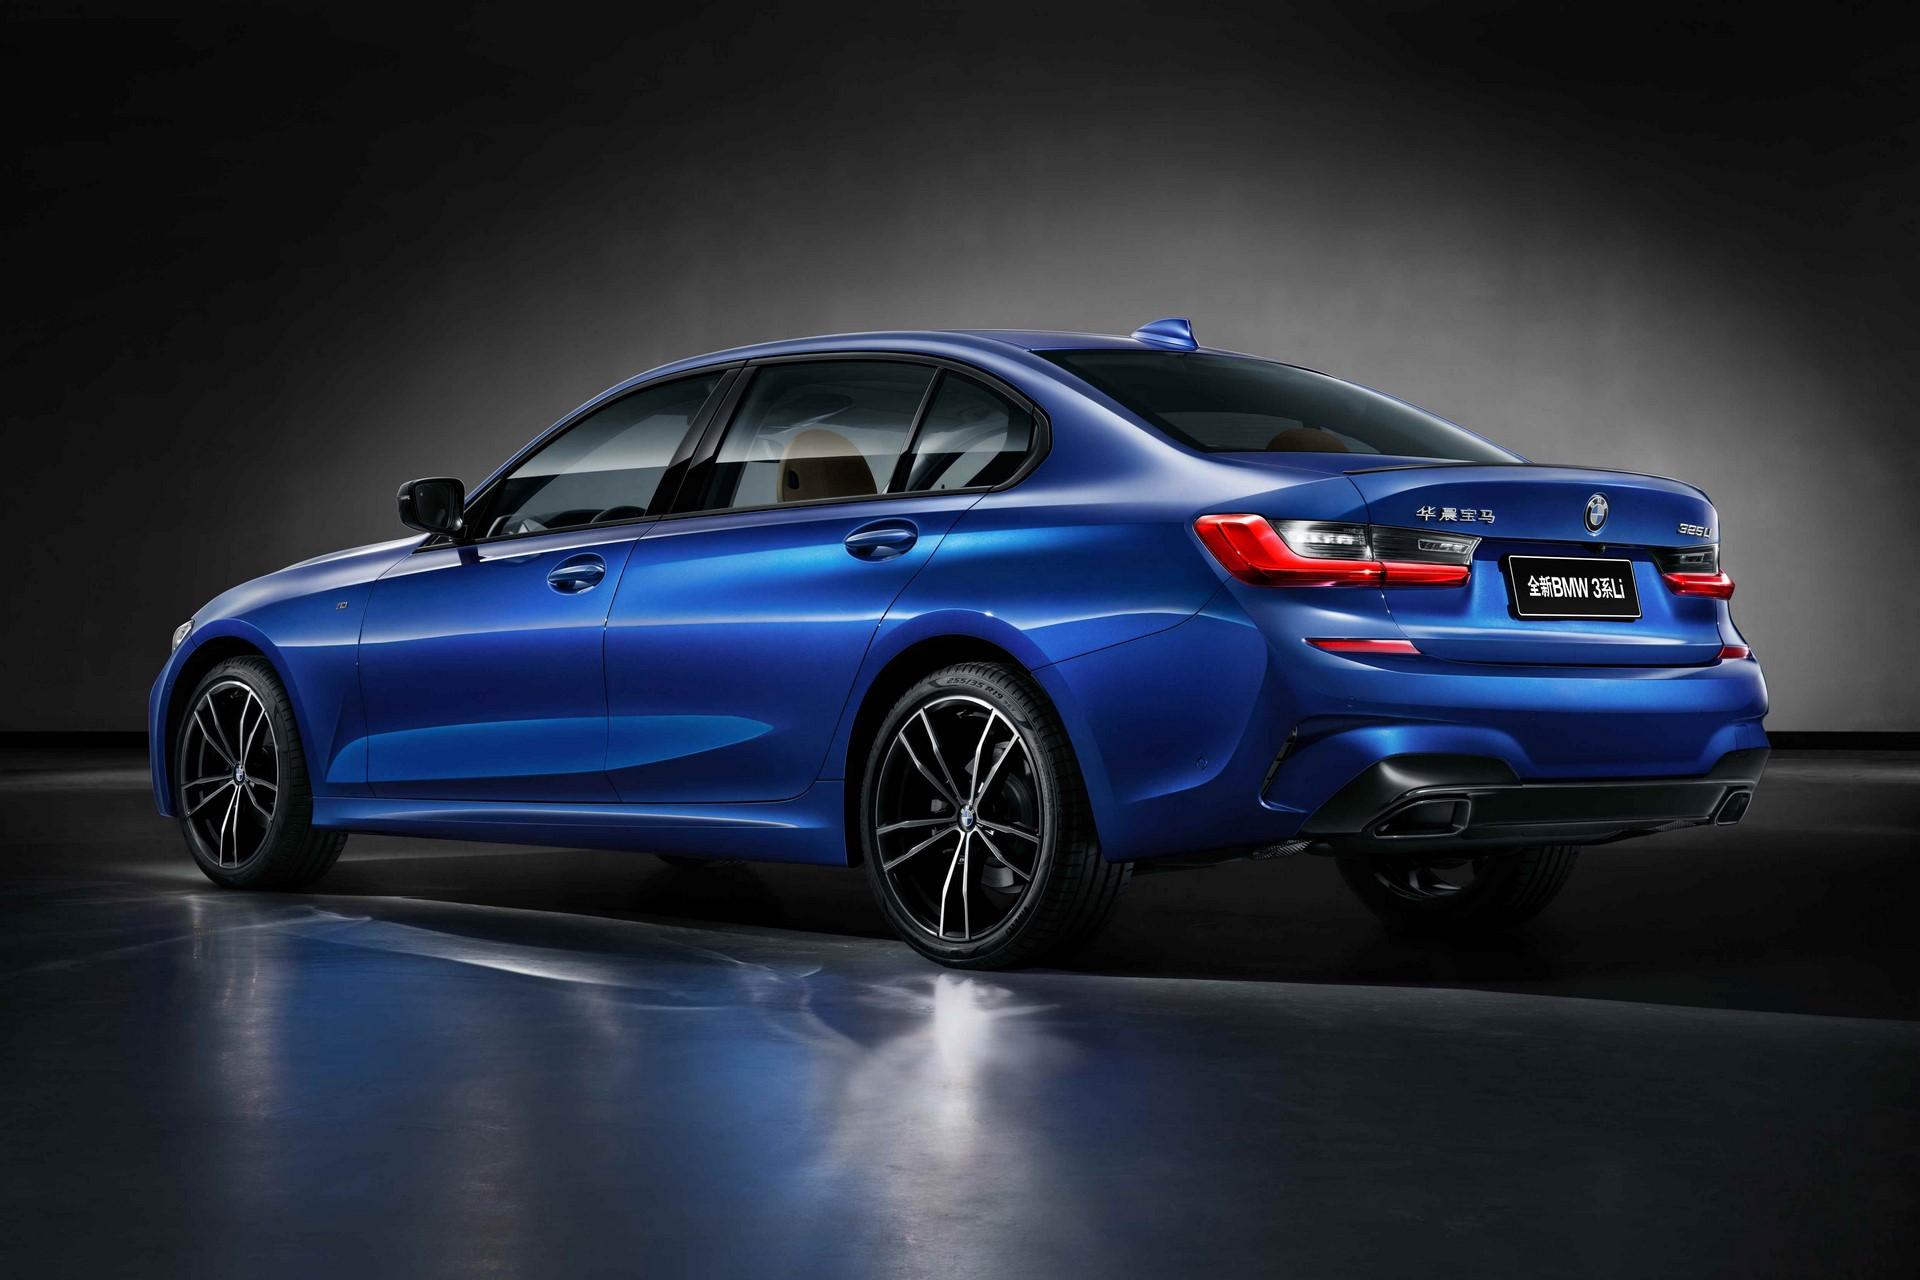 BMW-3-Series-LWB-Long-Wheelbase-2019-11